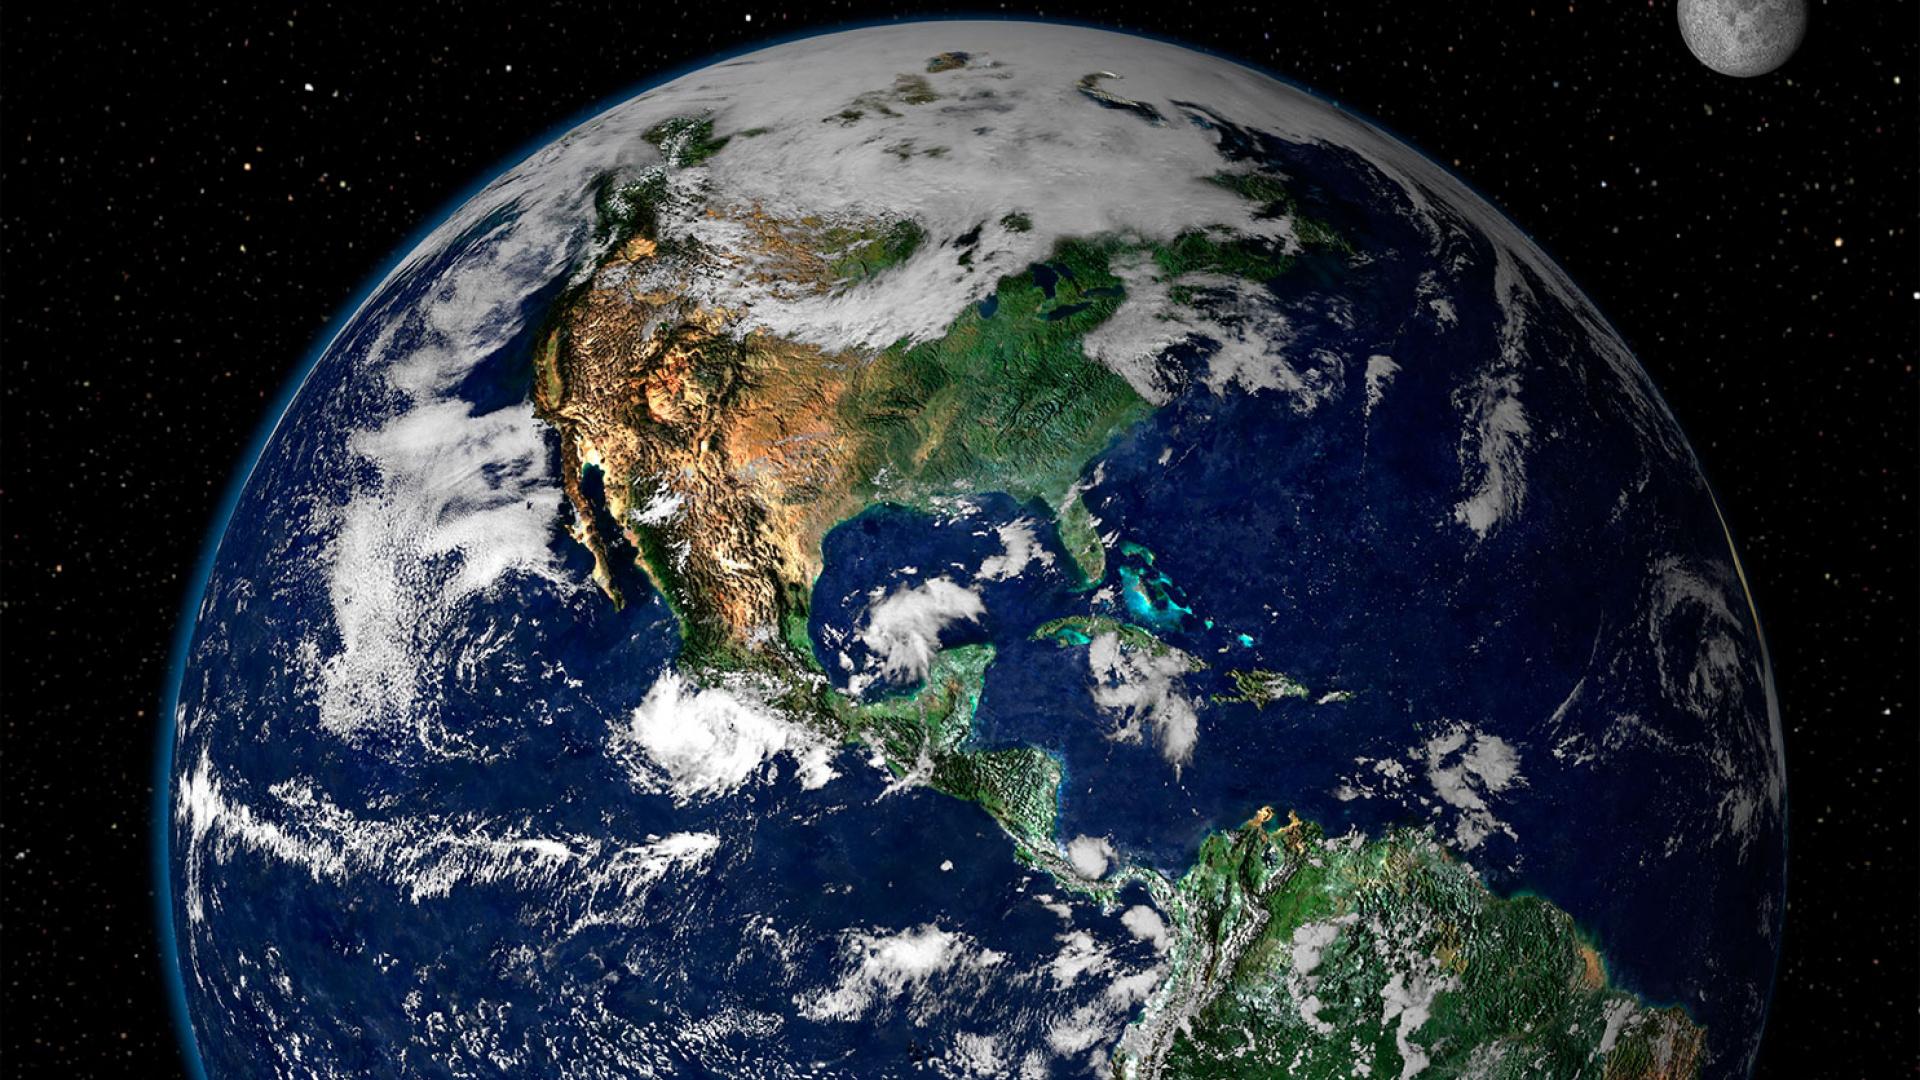 A shot of the Earth from space, via NASA/GSFC/Reto Stöckli, Nazmi El Saleous, and Marit Jentoft-Nilsen